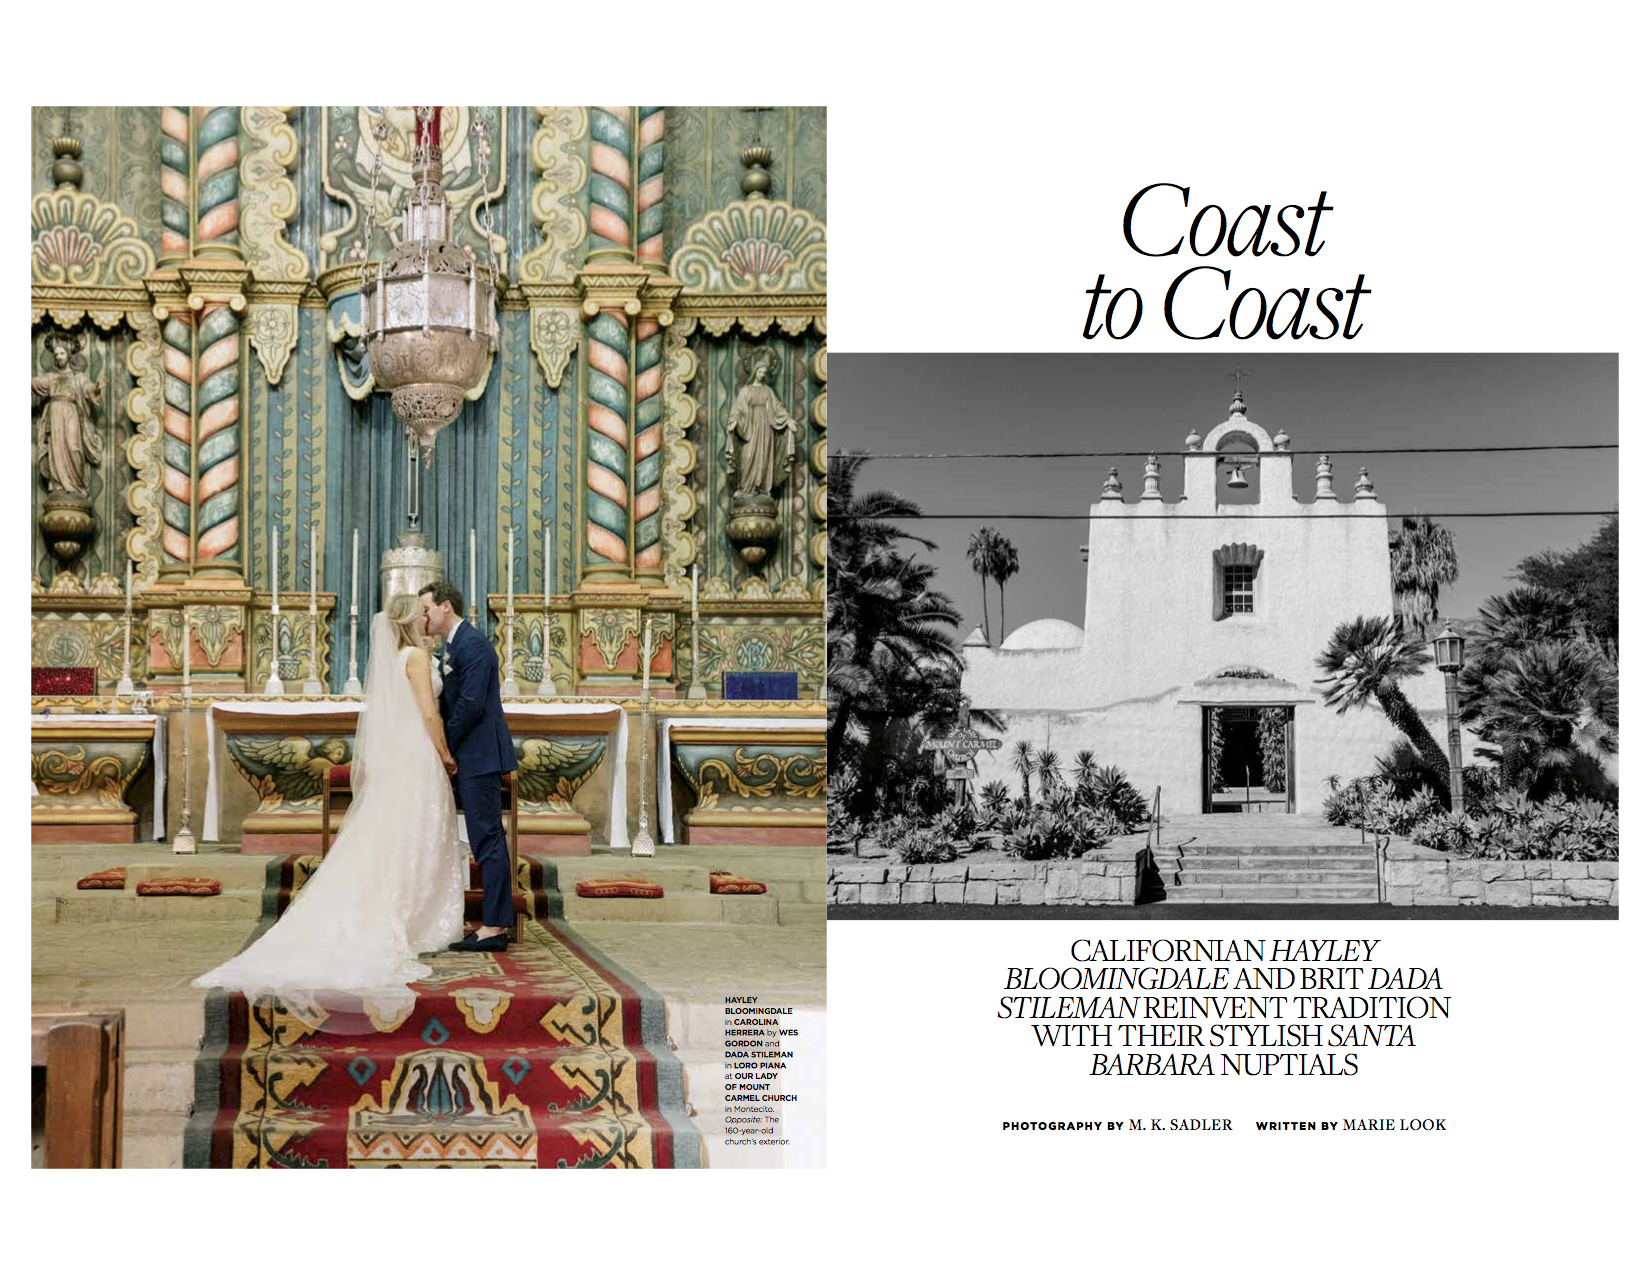 C Weddings_Spring_2019, Coast to Coast (Hayley+Dada)_spread 1.jpg